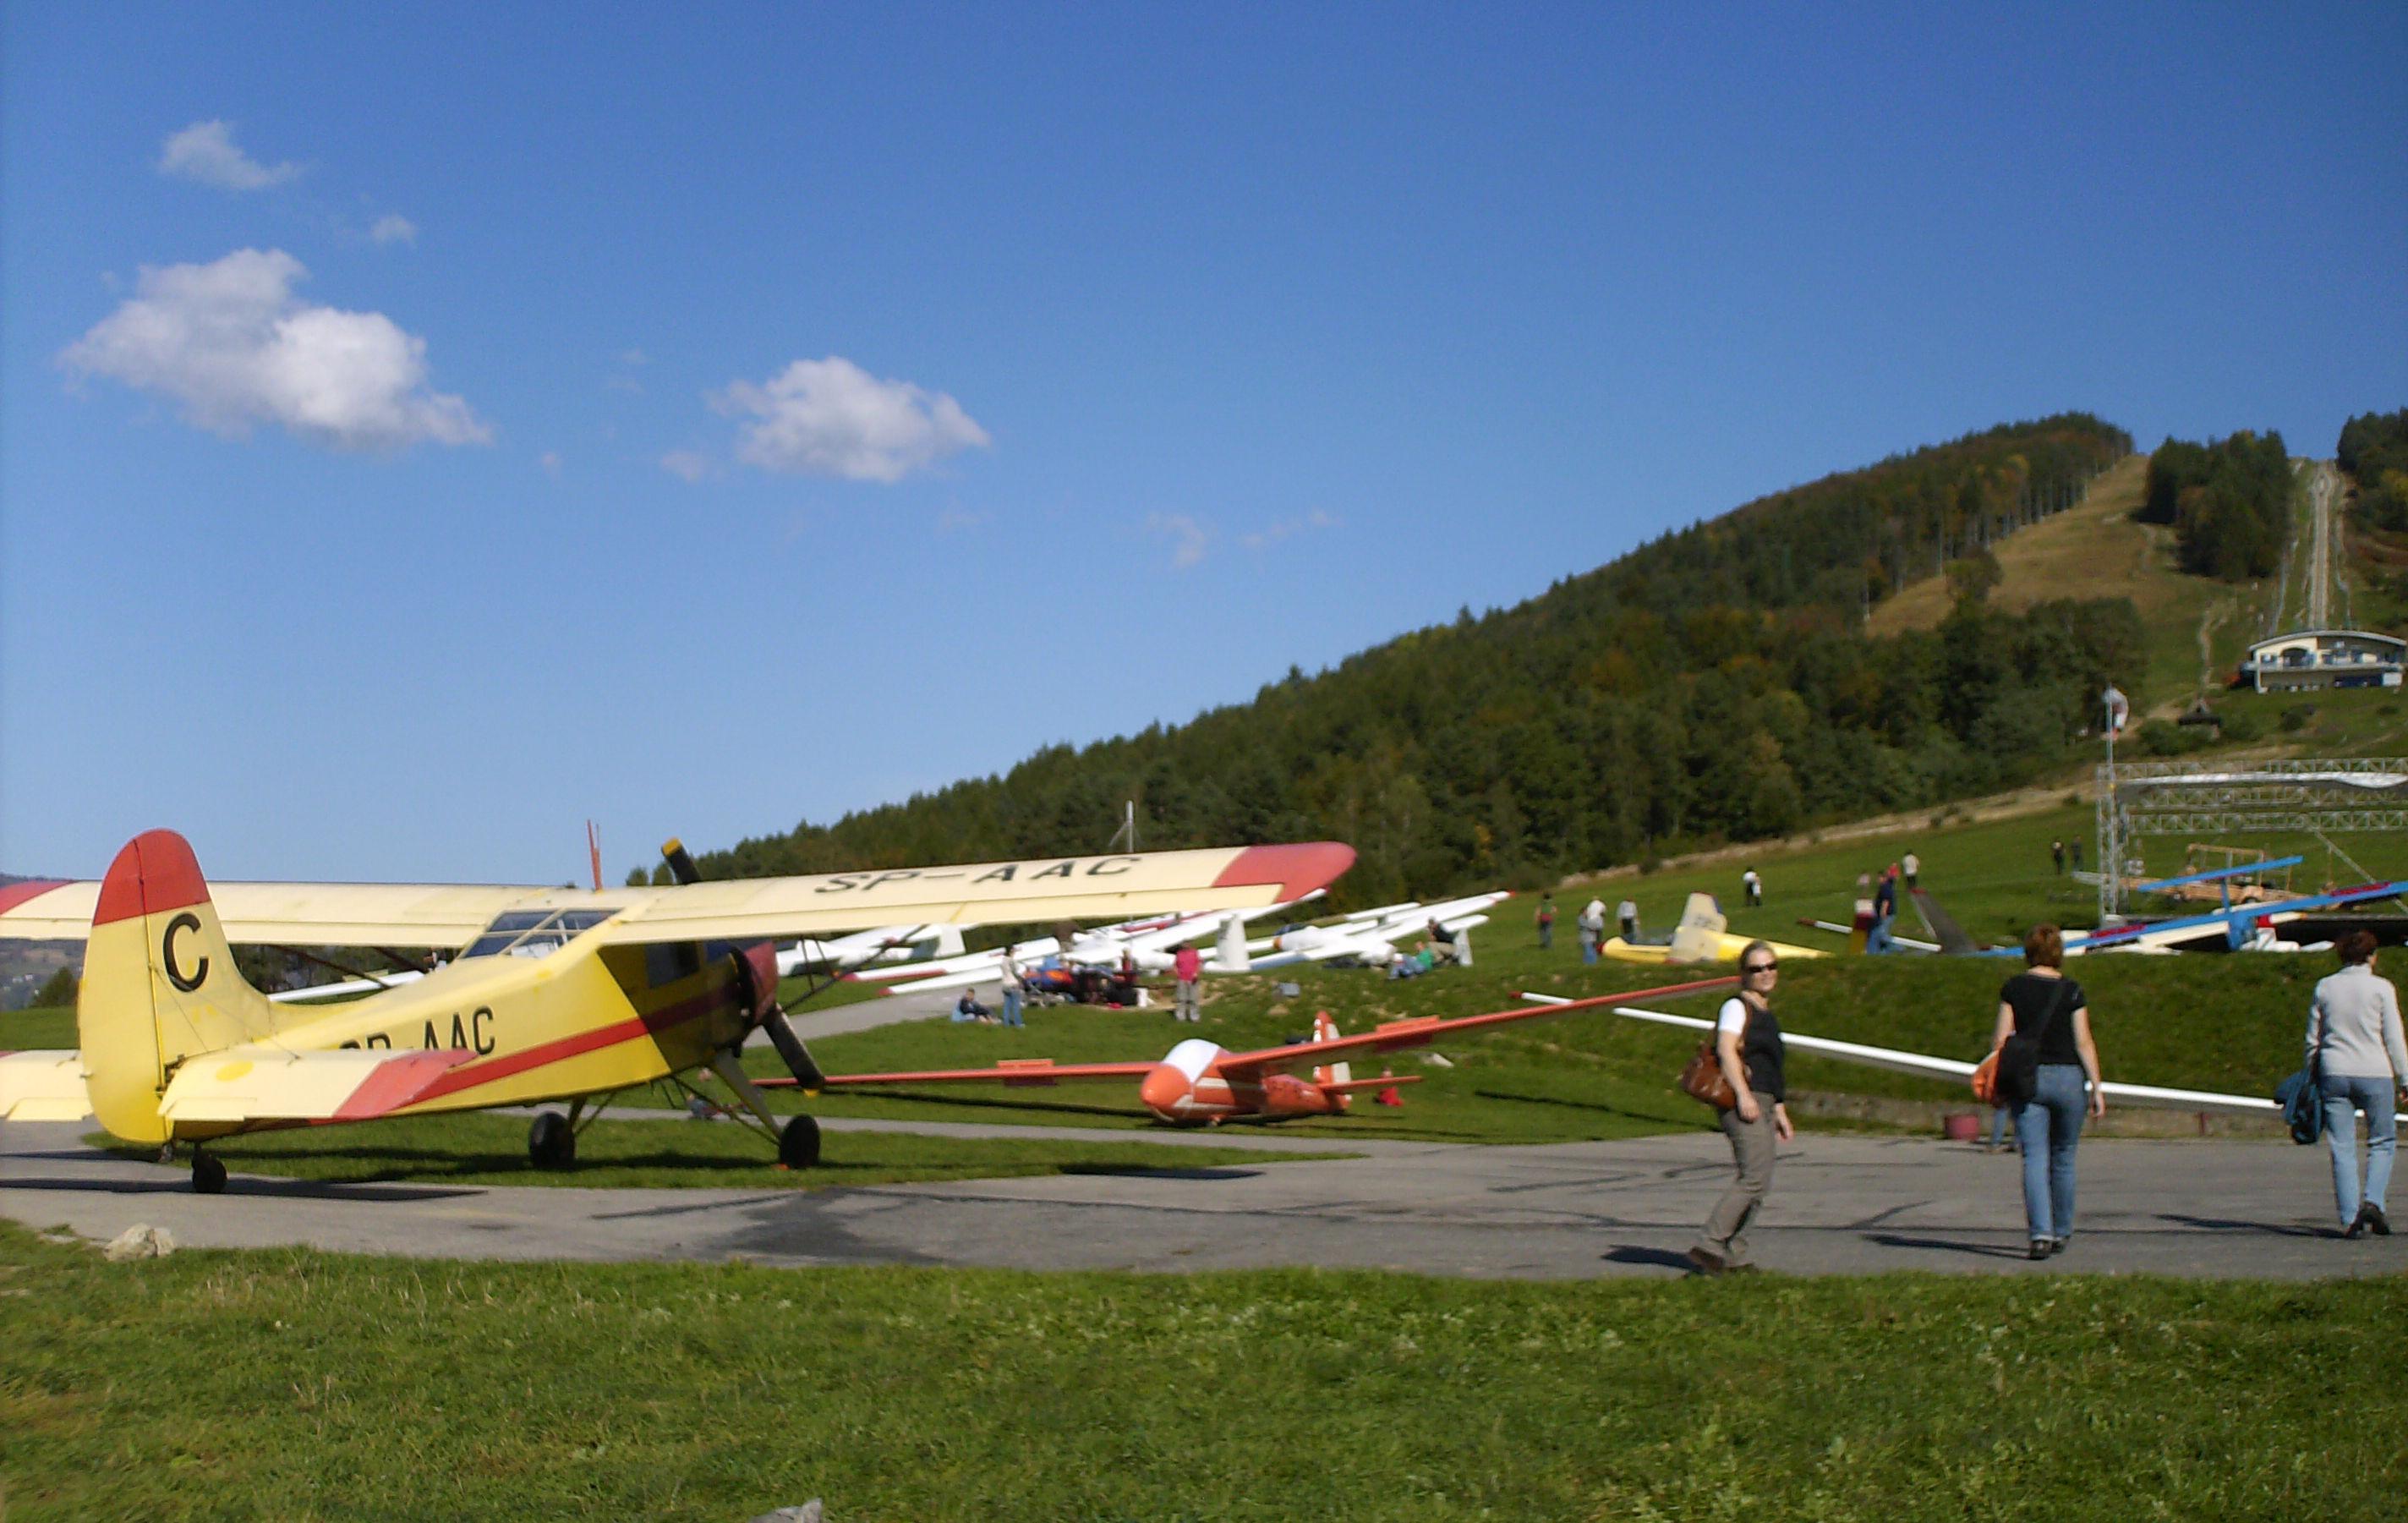 Okolica - Góra Żar - lotnisko